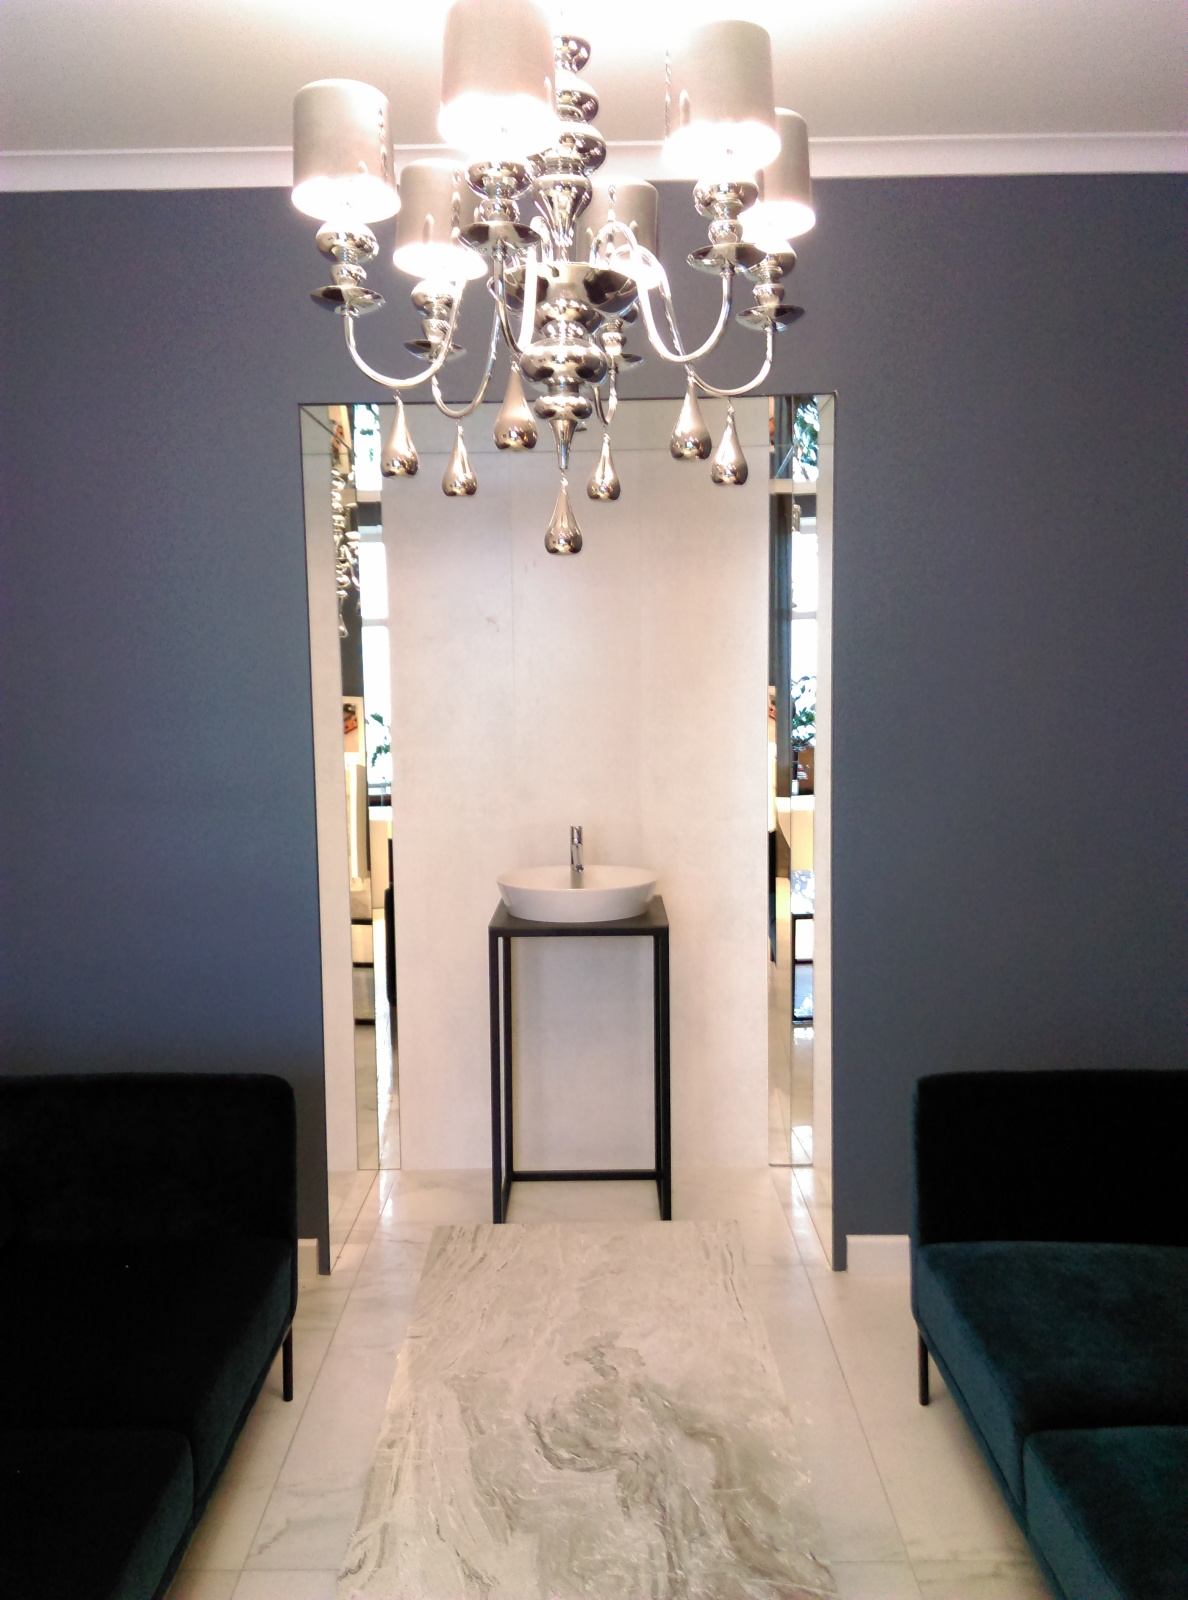 Salon Camero Design Lublin Ul Rusałka 15 Imperocompl